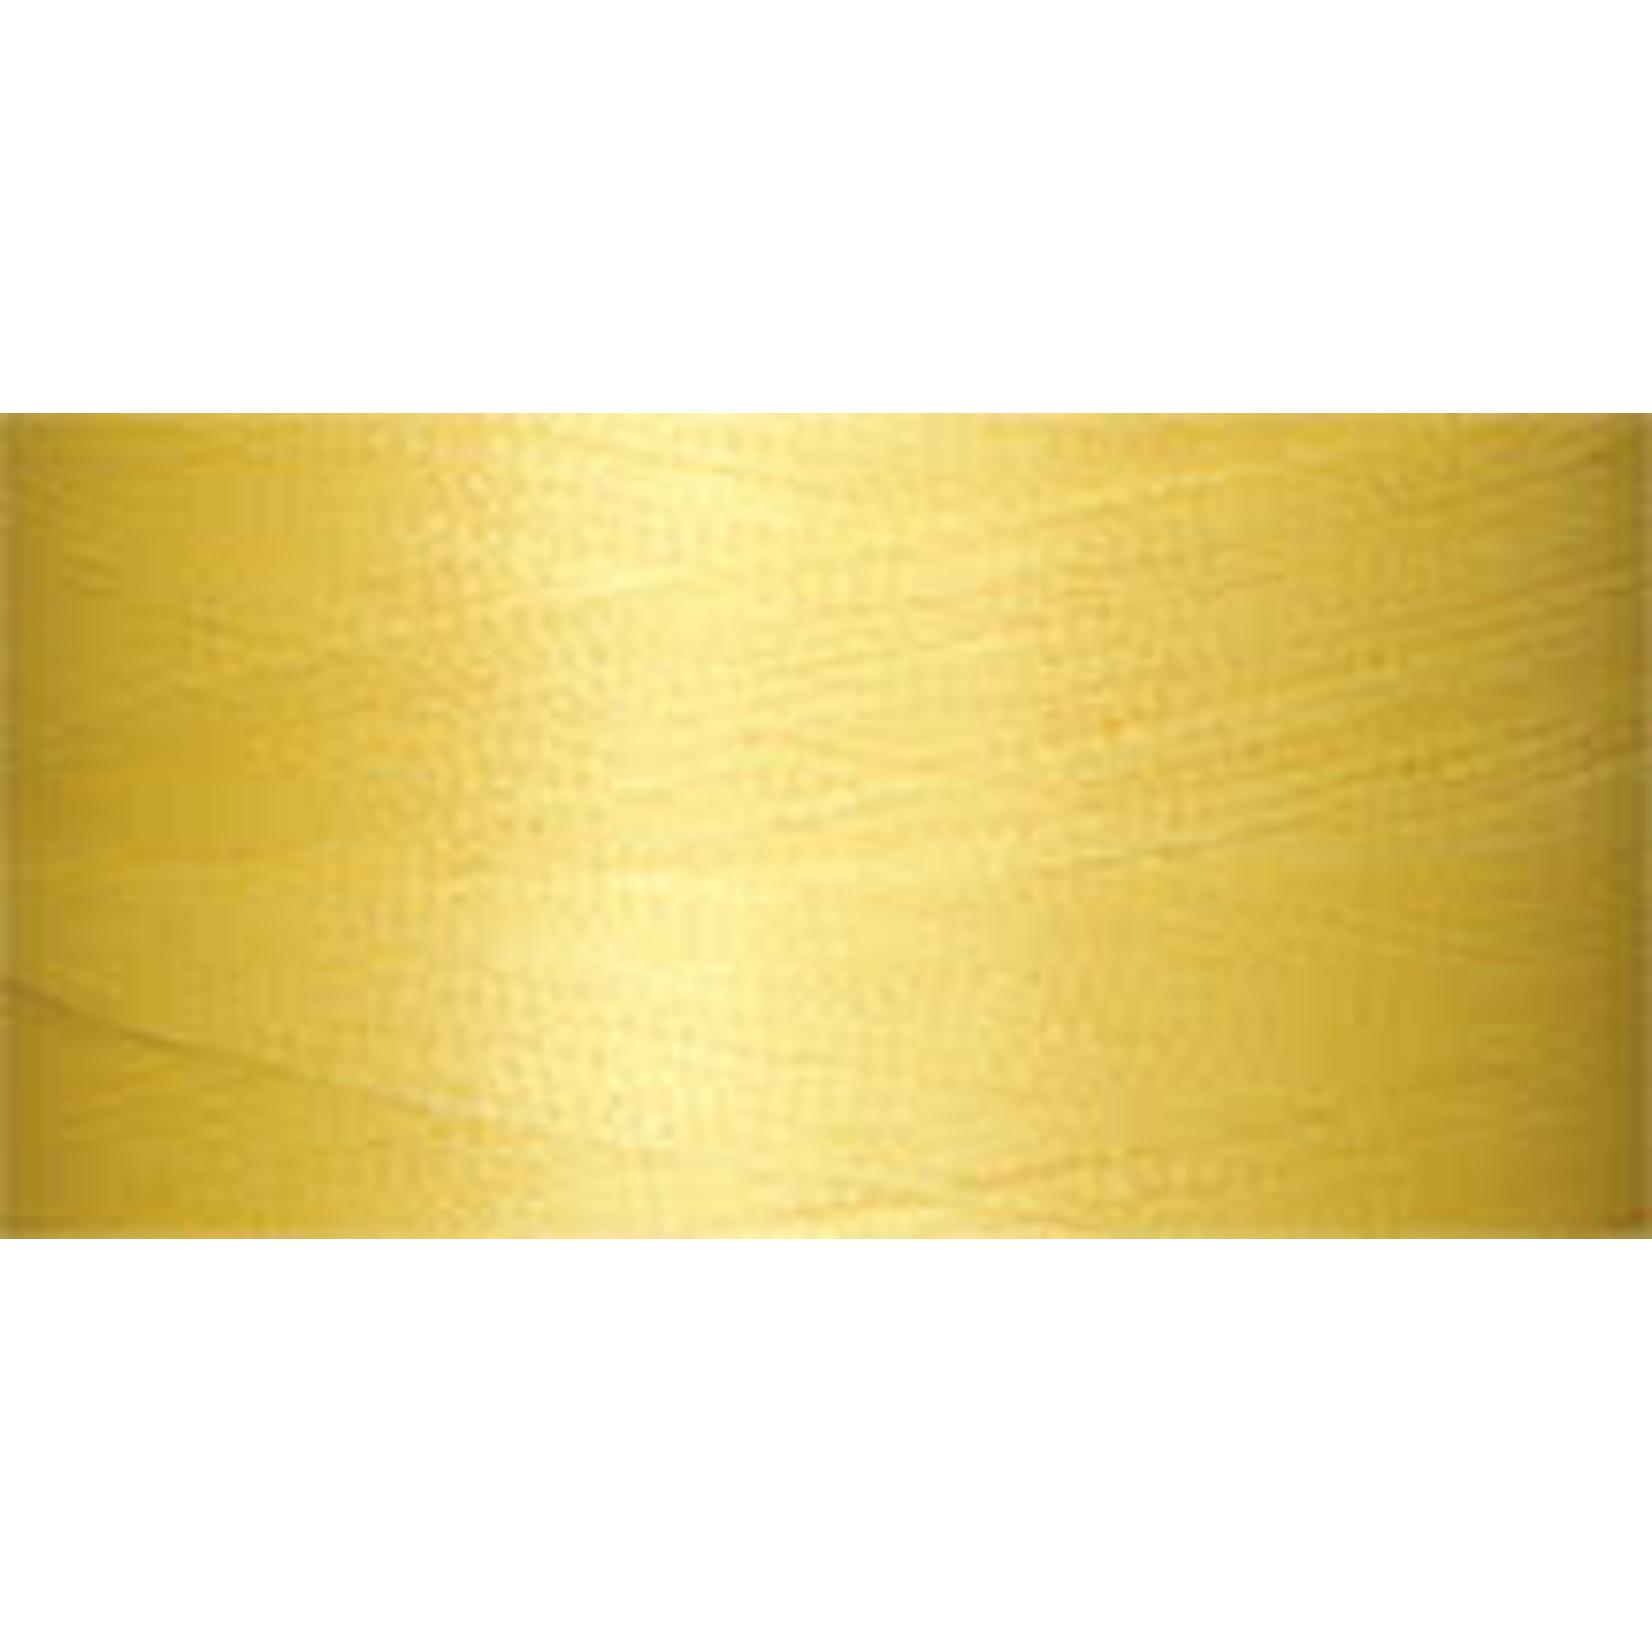 Superior Threads Bottom Line - #60 - 1300 m - 601 Yellow